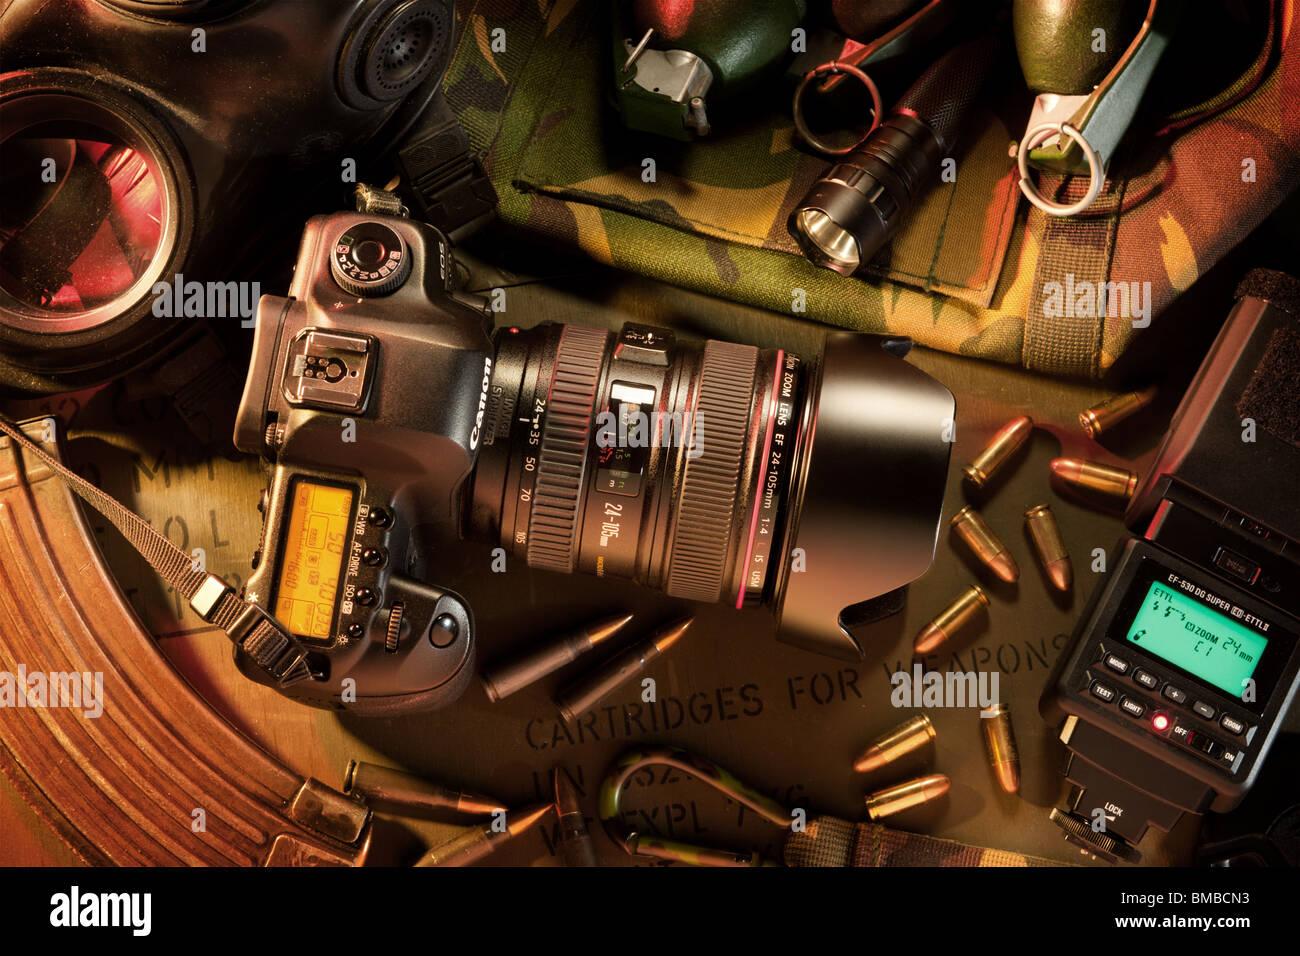 War photography - Stock Image